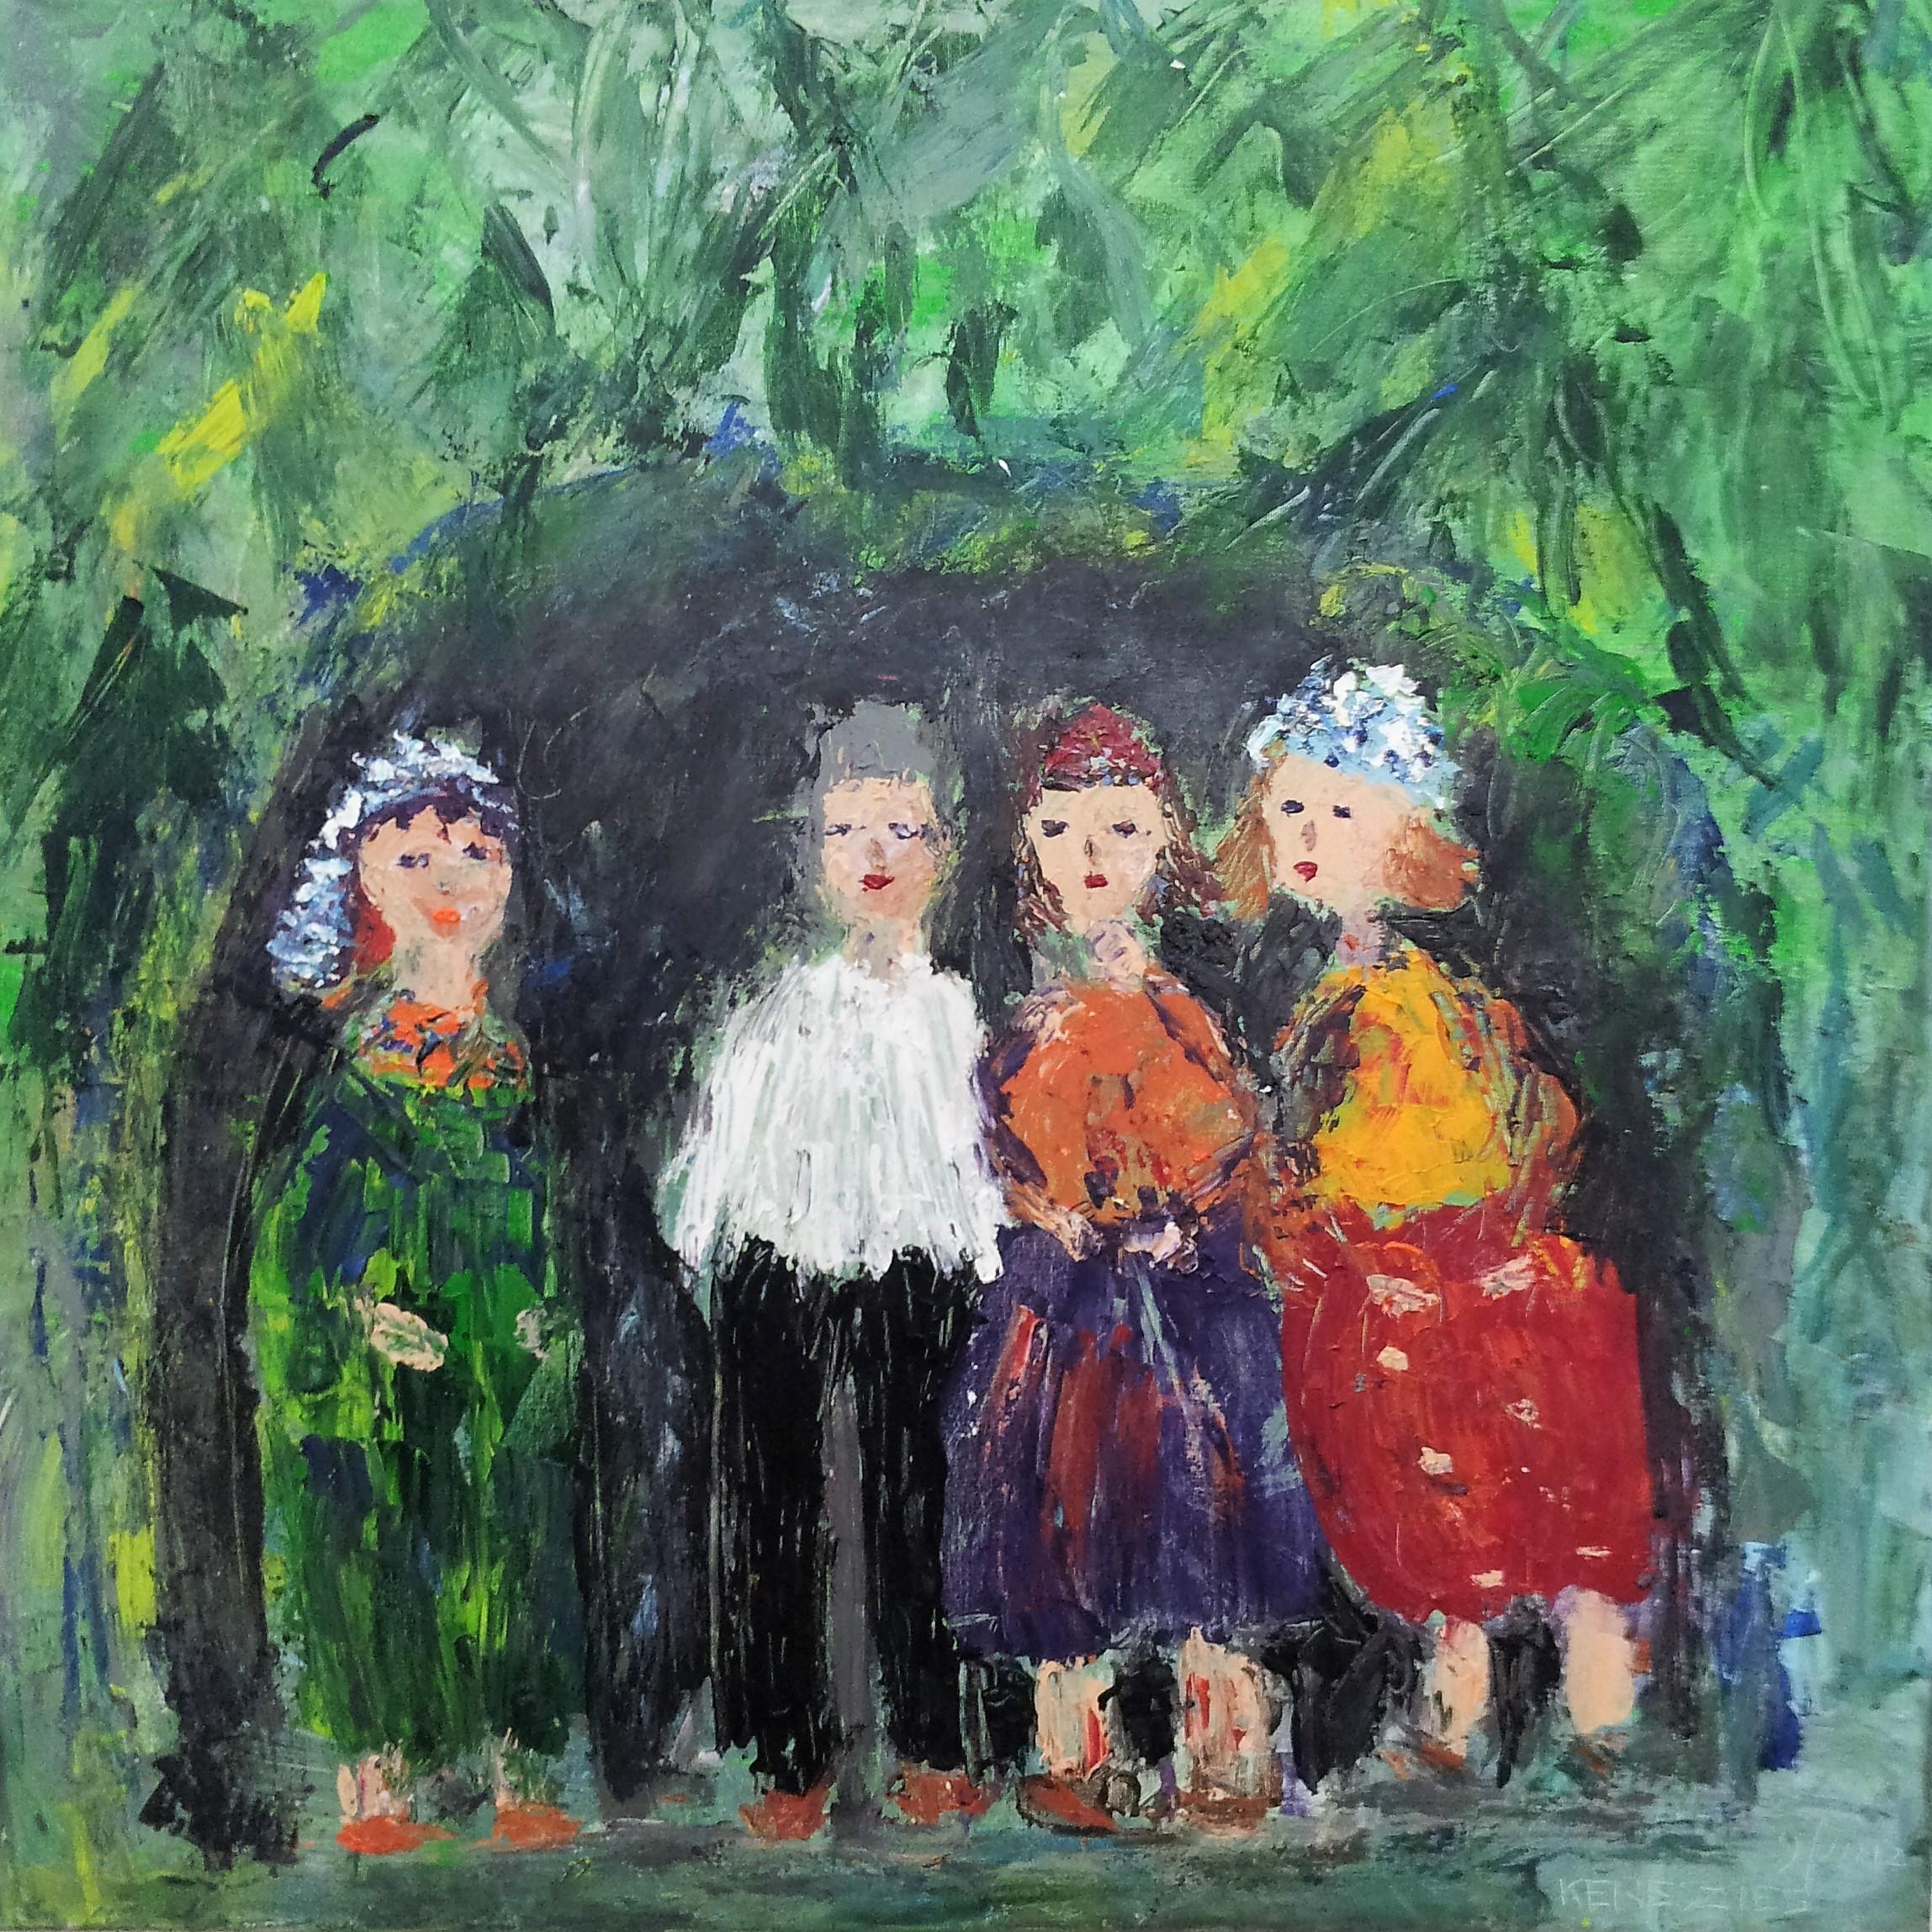 toile sous les arbres dsc 3662 - magdalena keresztes, artiste